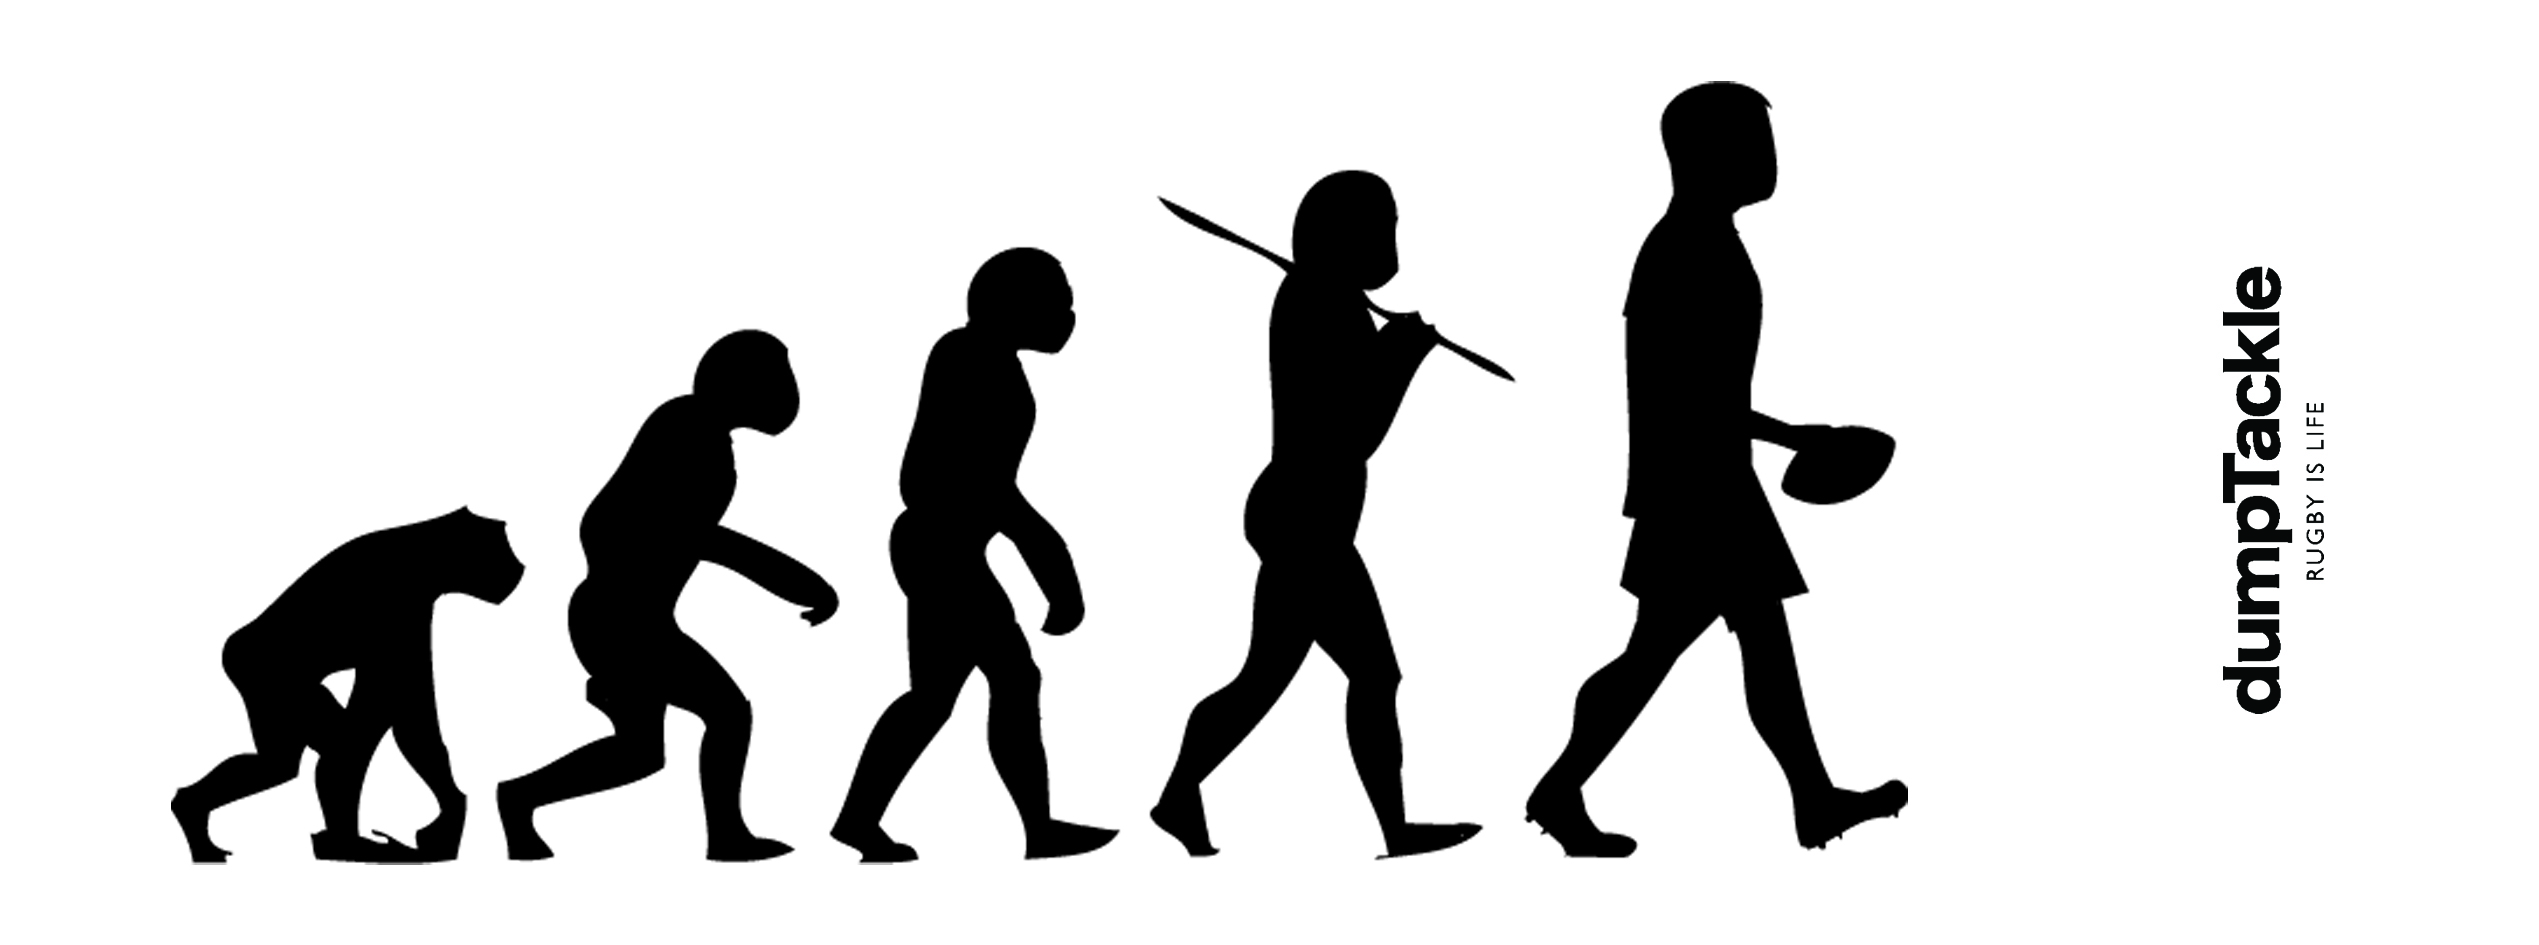 2539x945 Evolution Of Man